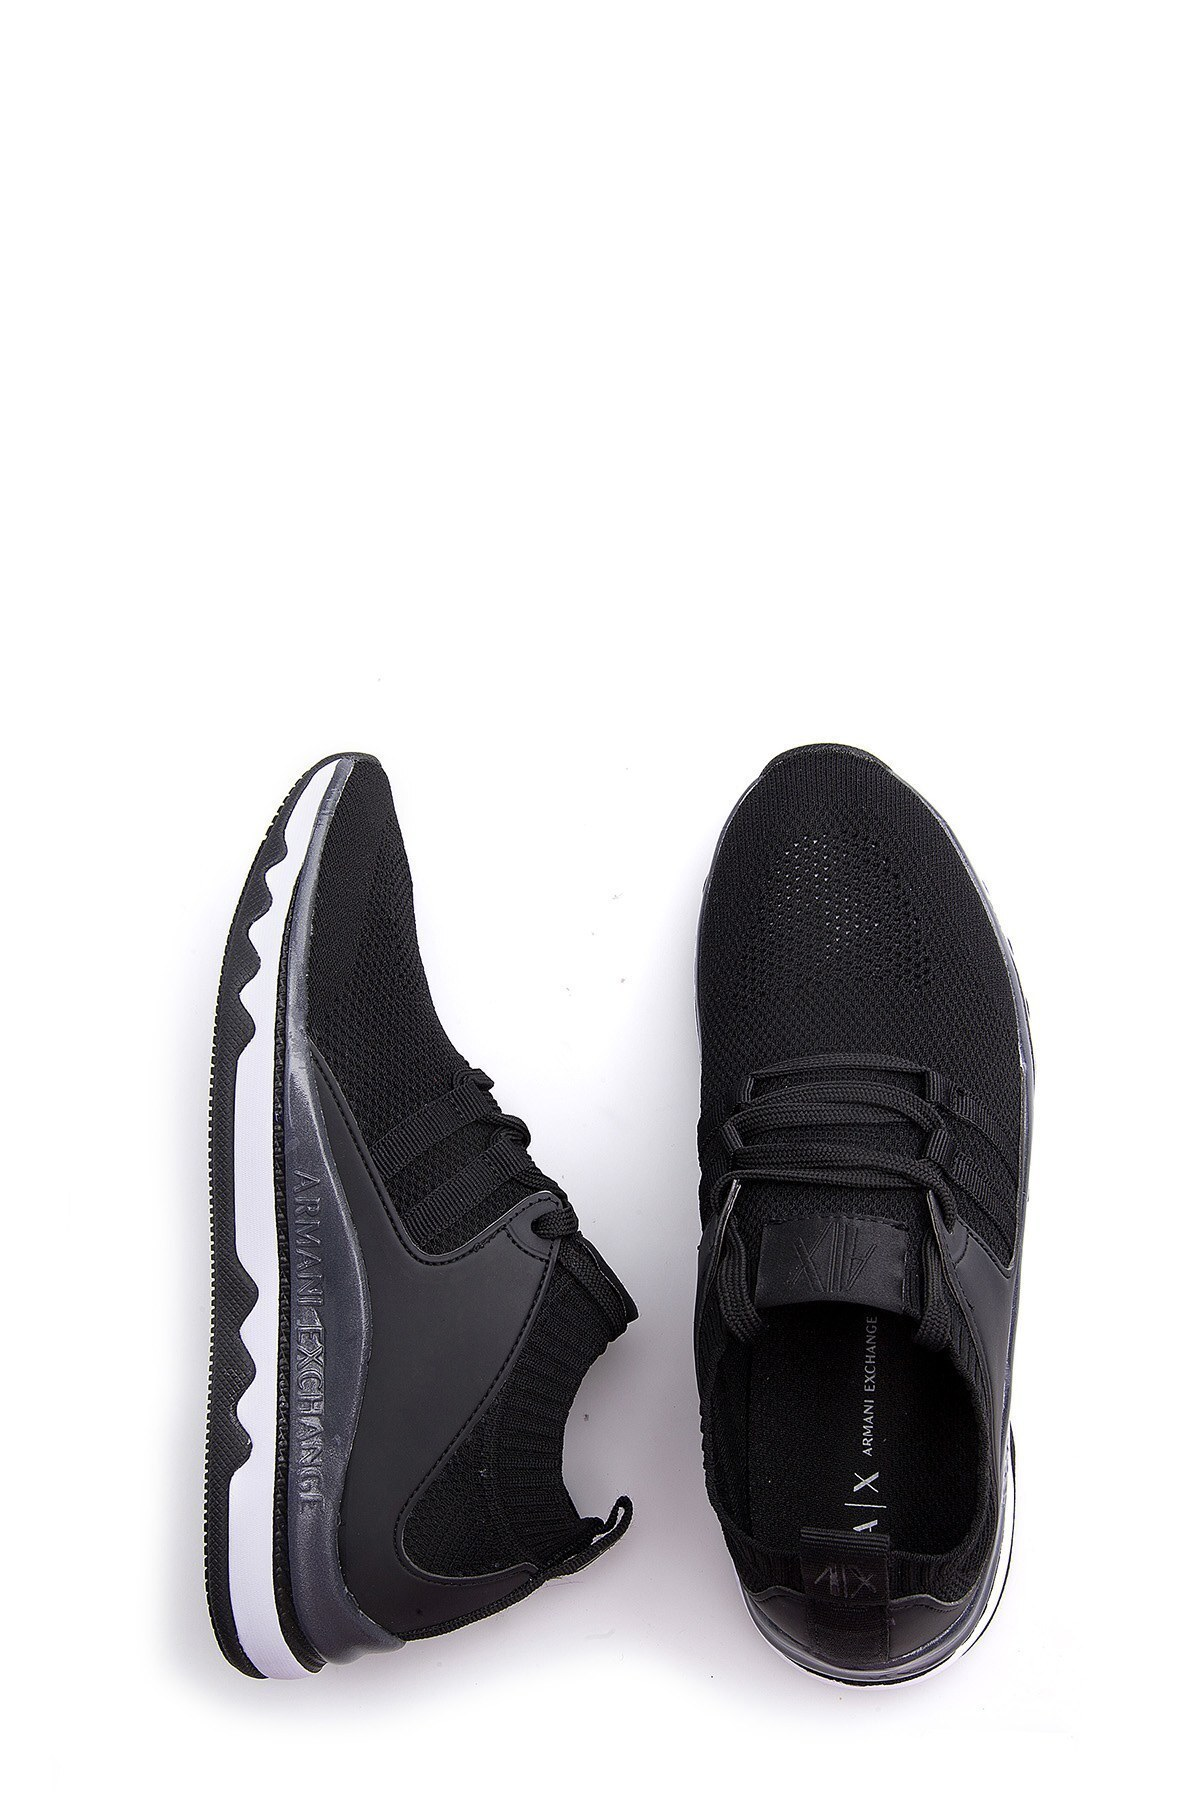 ARMANI EXCHANGE Kadın Ayakkabı XDX007 XV067 00002 SİYAH